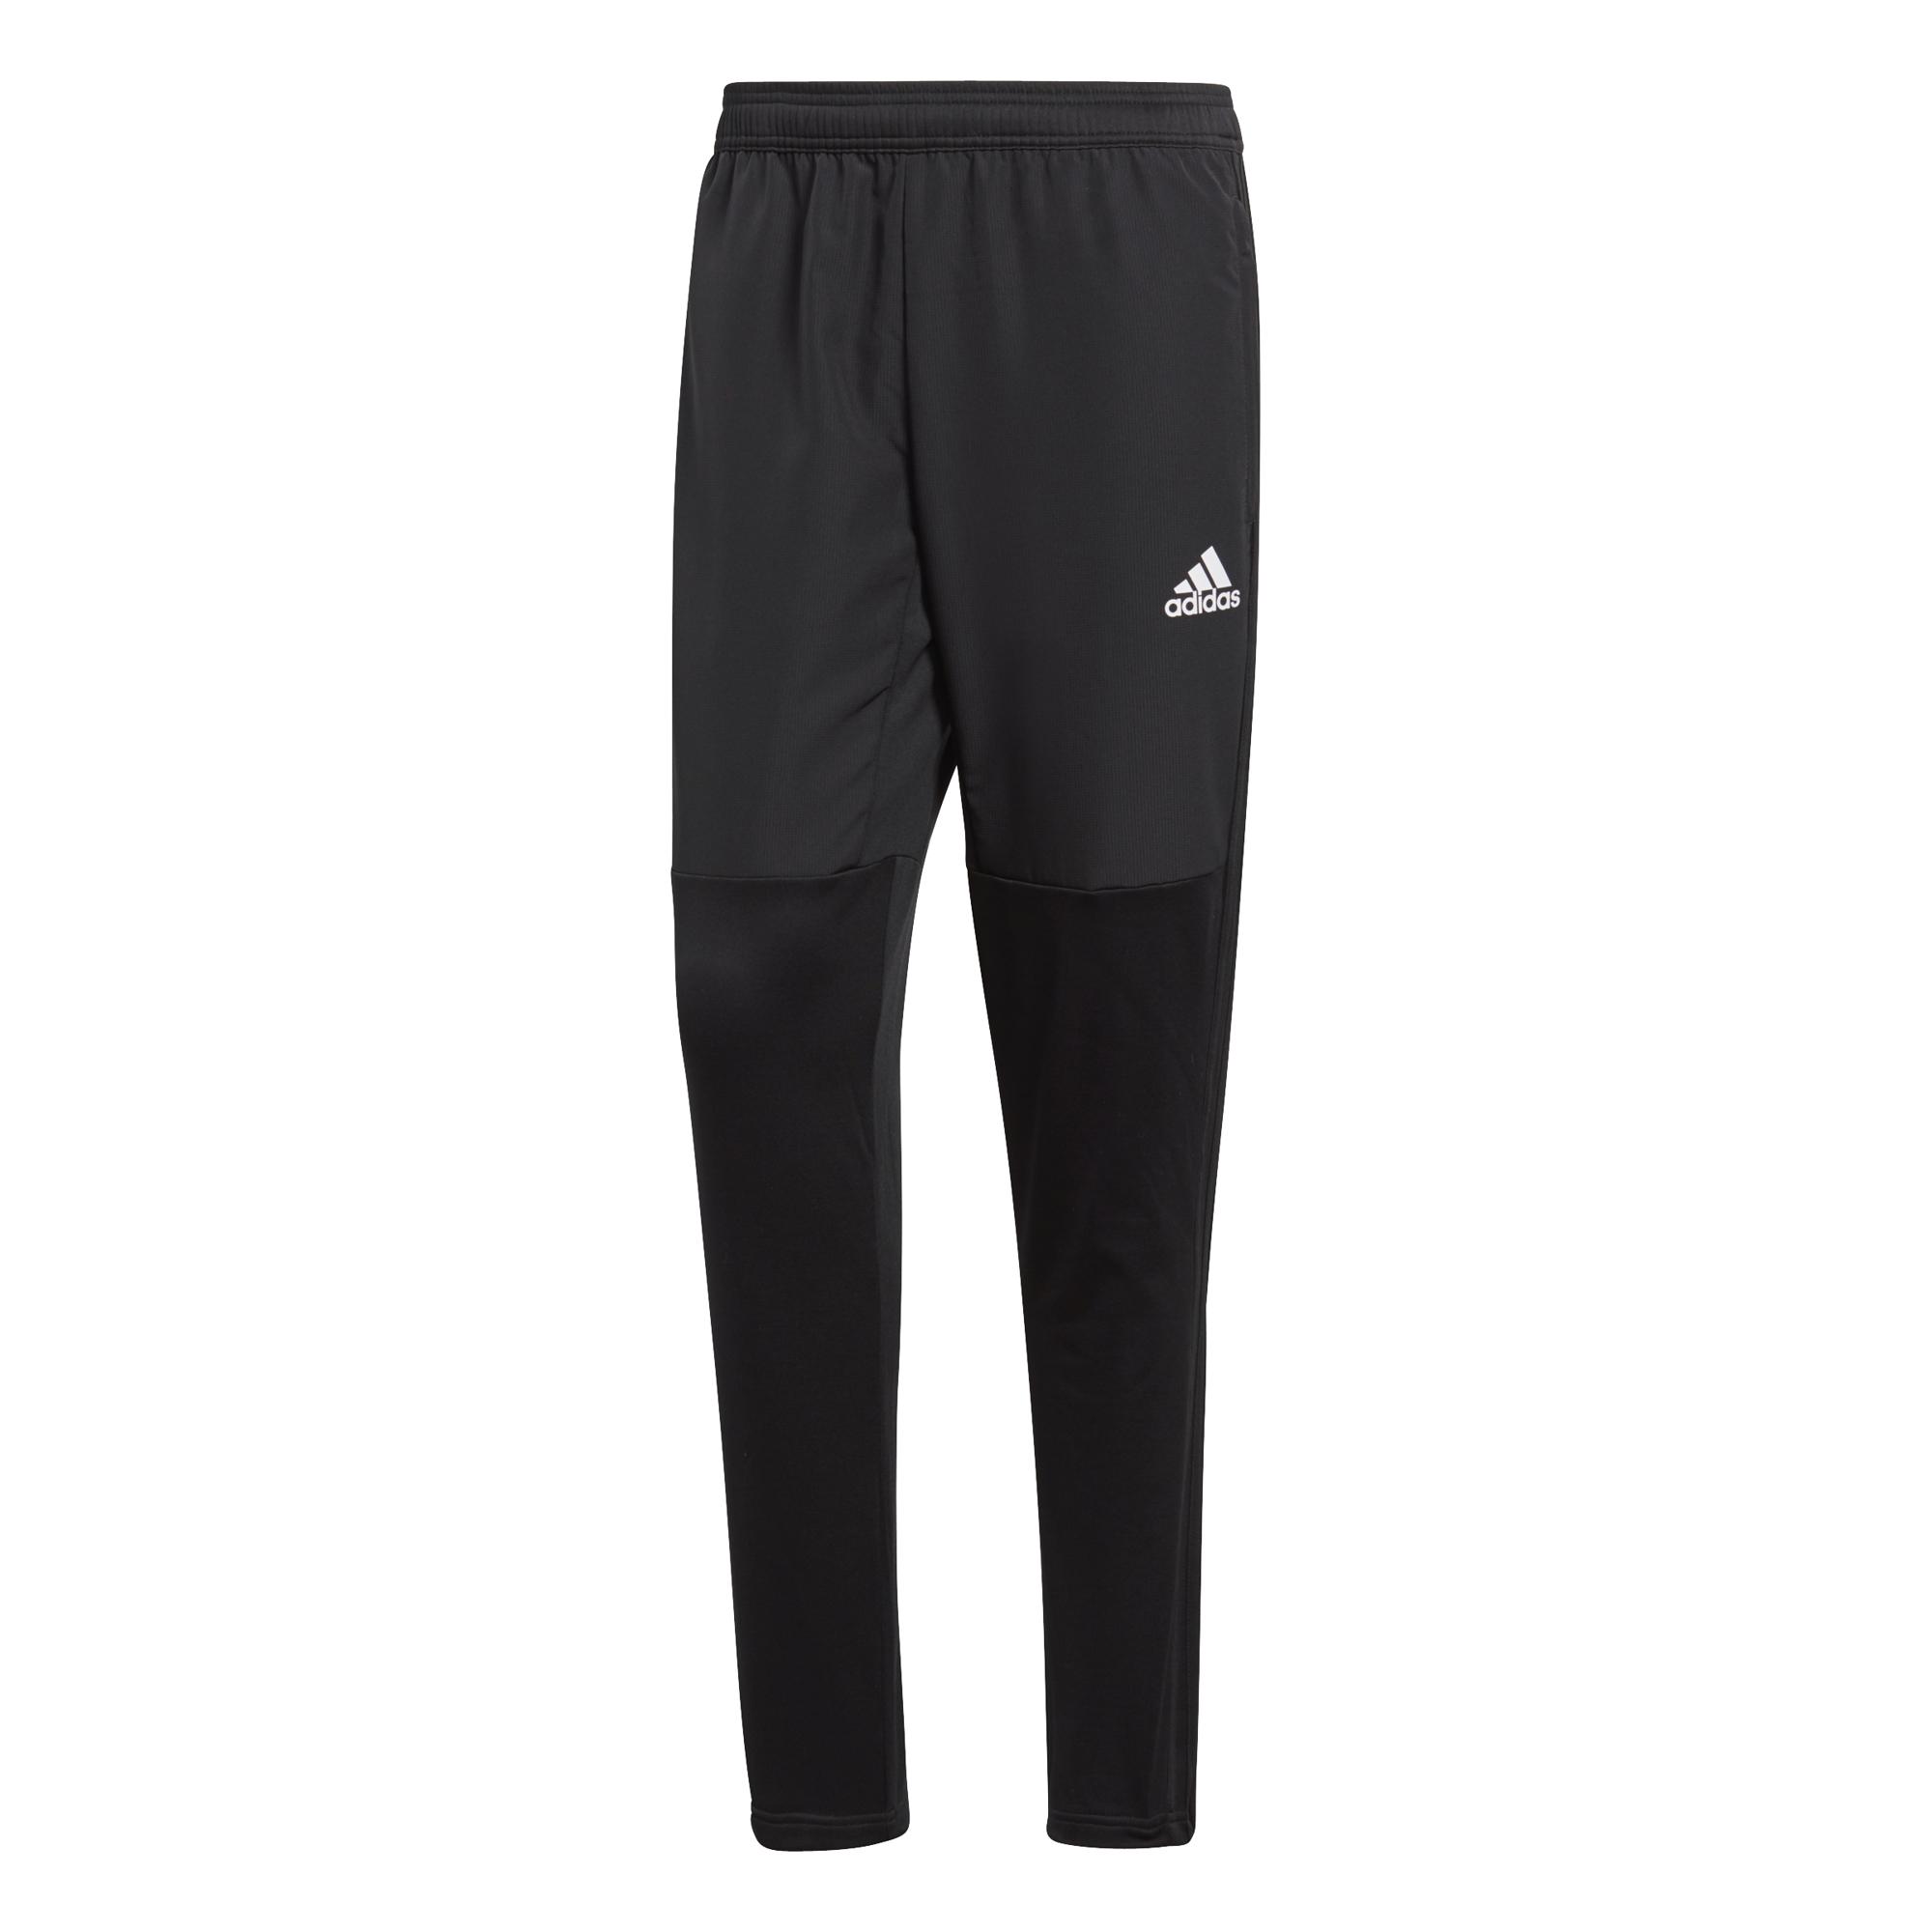 ADIDAS tréninkové kalhoty Condivo 18 Warm Pant